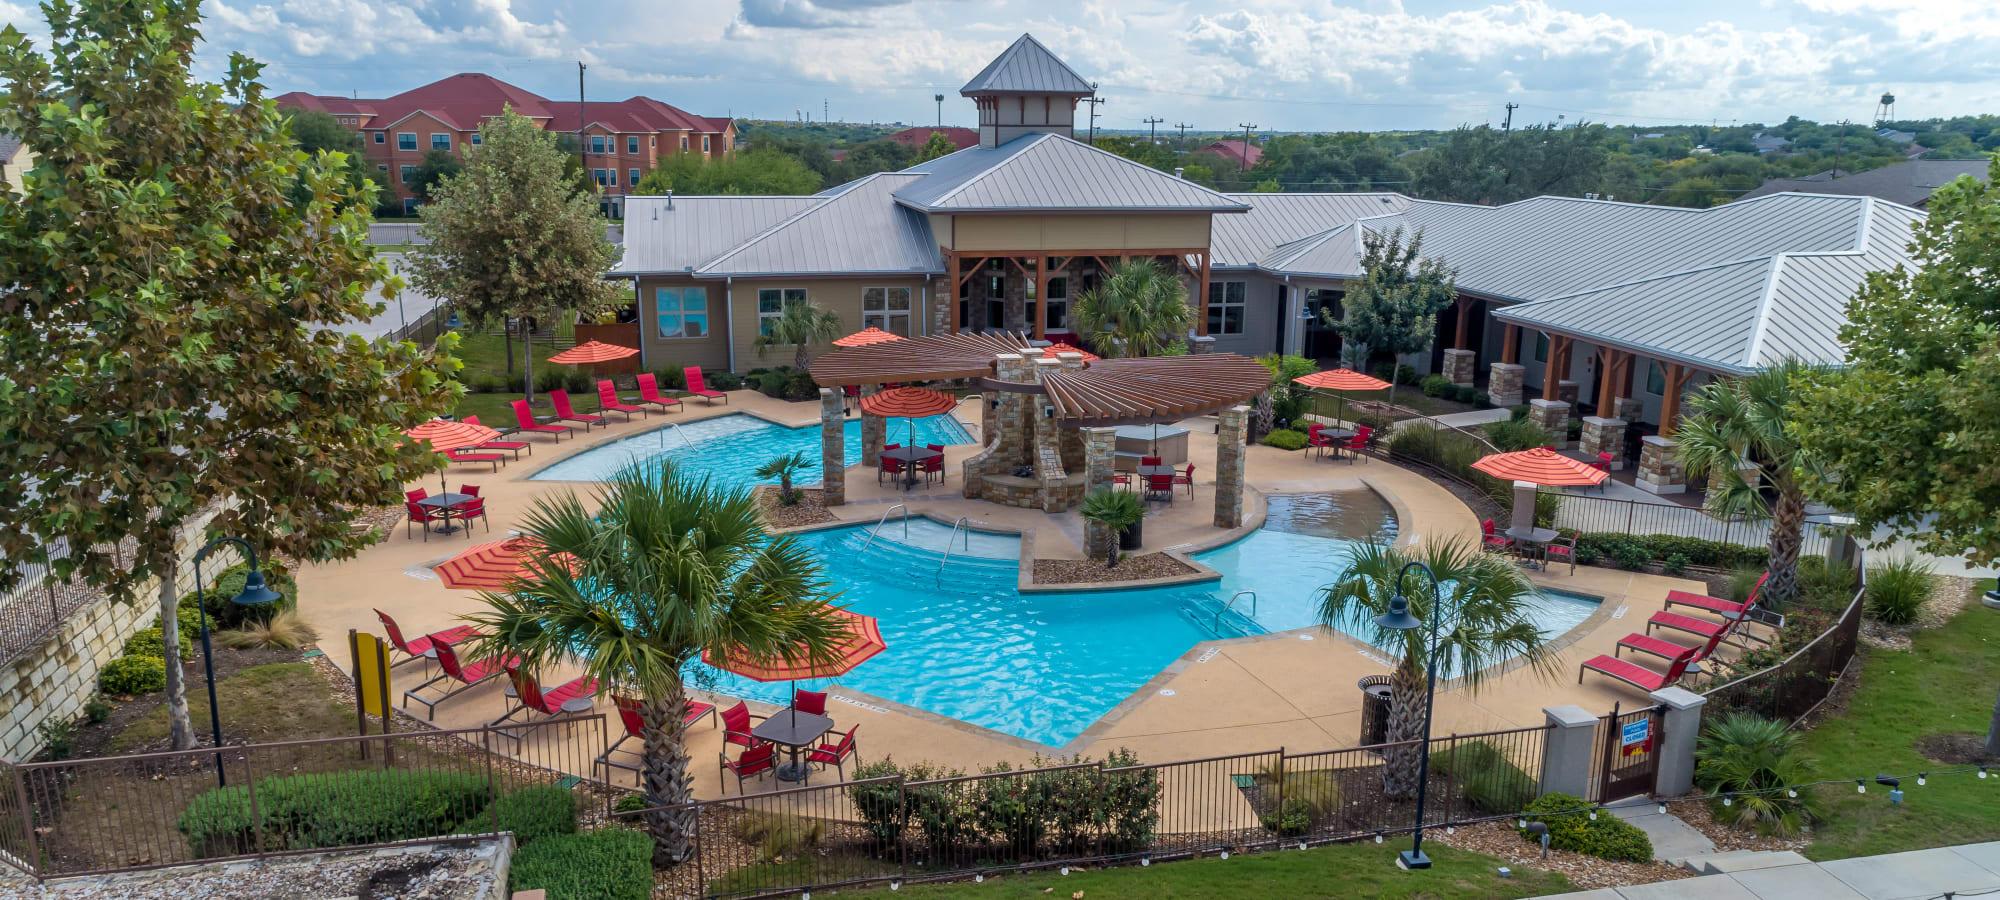 Apartments at Firewheel Apartments in San Antonio, Texas